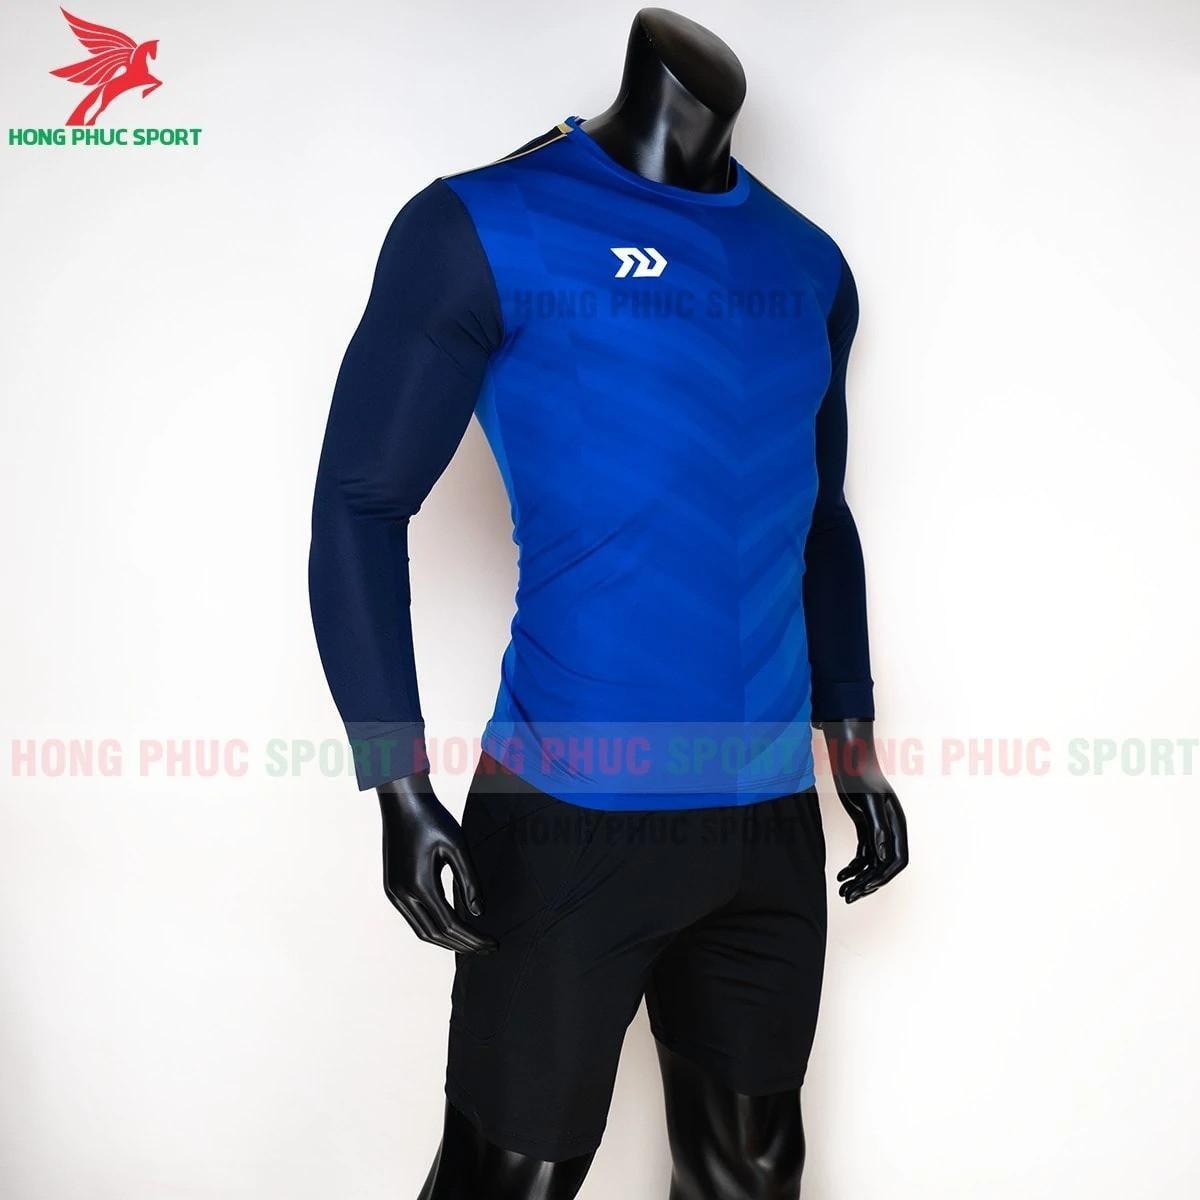 https://cdn.hongphucsport.com/unsafe/s4.shopbay.vn/files/285/ao-bong-da-thu-mon-bulbal-xanh-duong-4-5f72ae033e21a.jpg